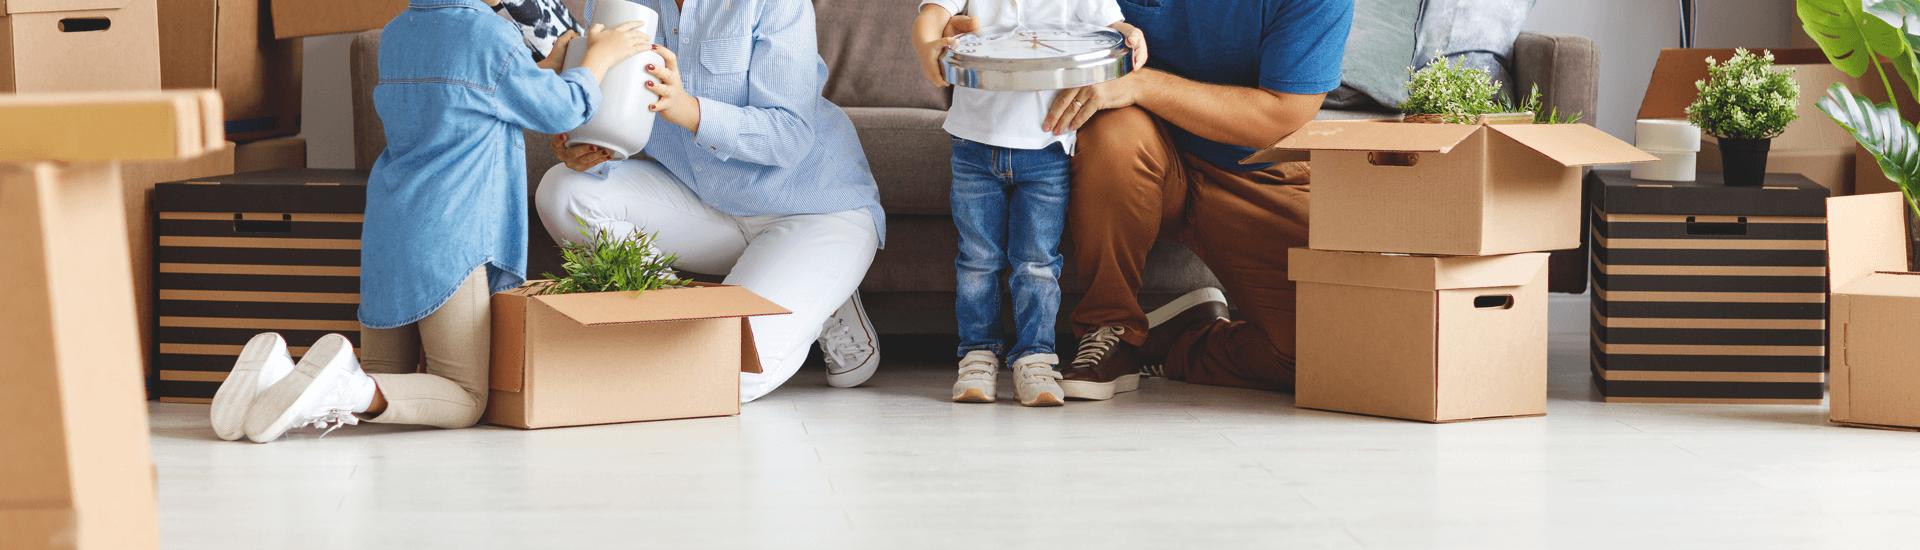 immobilienfinanzierung-familie-packt-zusammen-teil-2